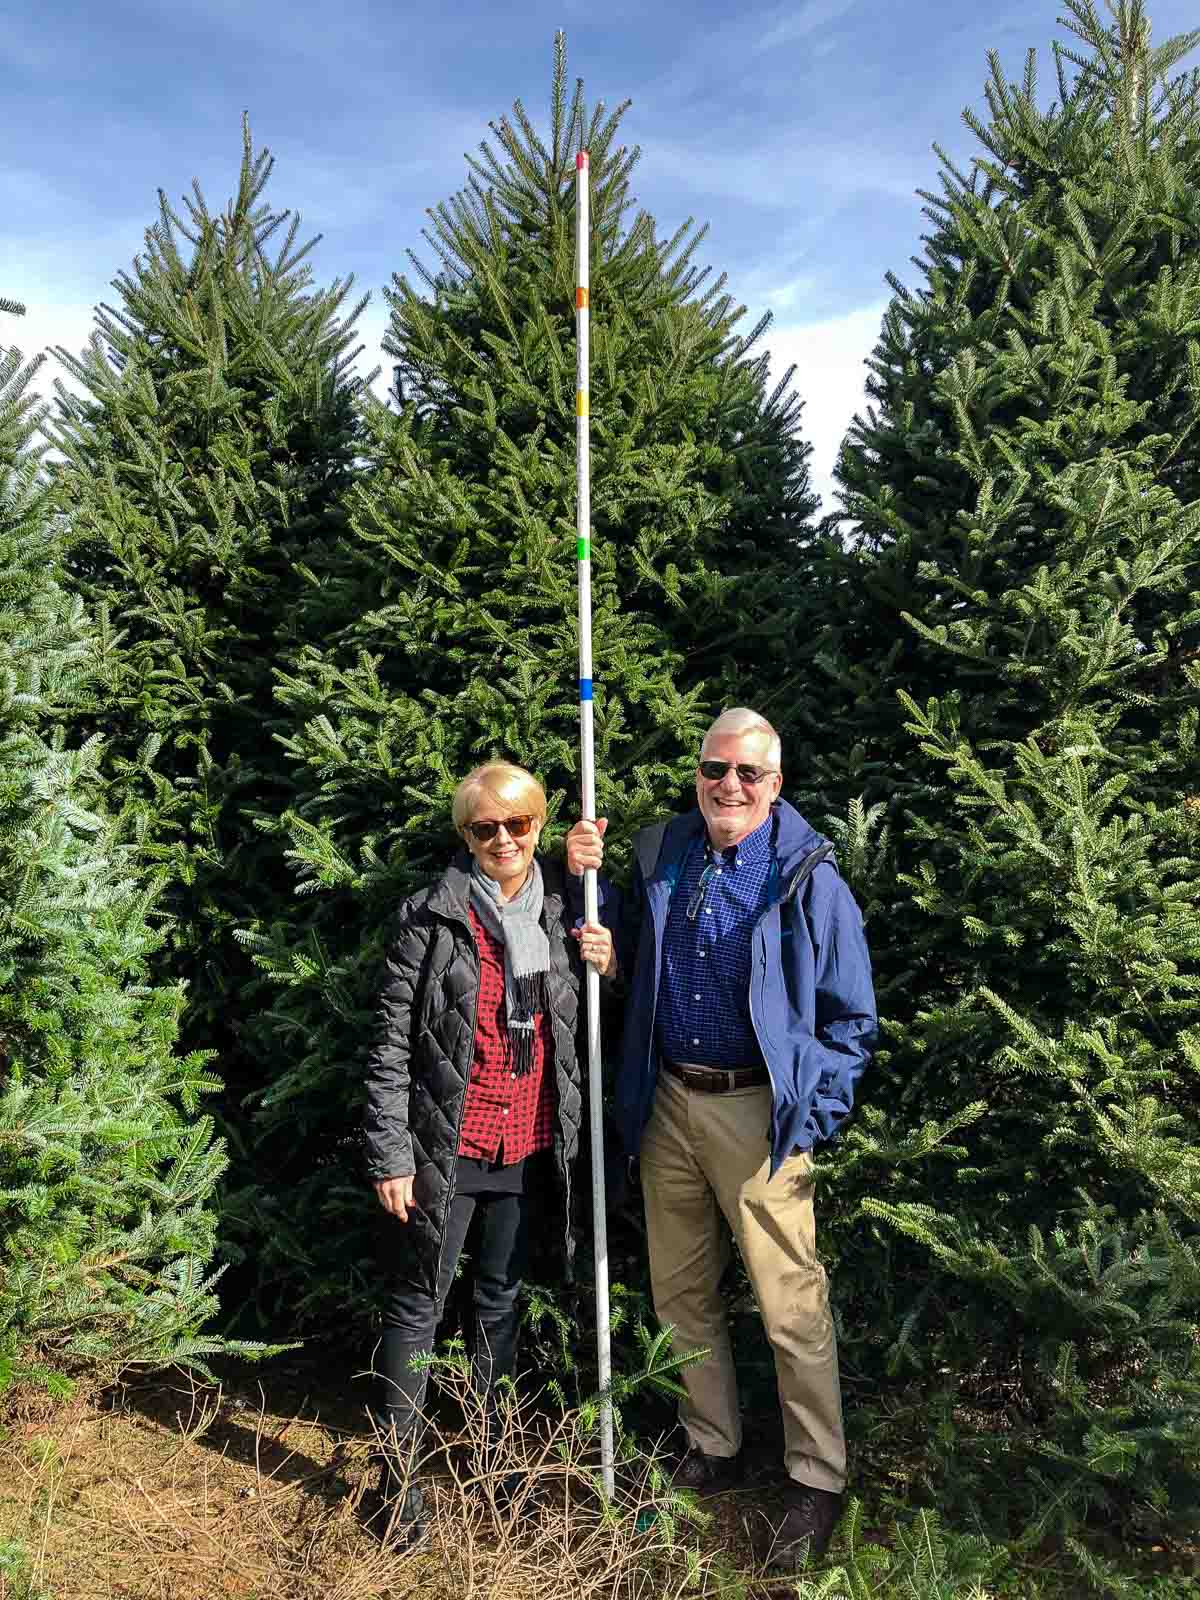 Photo of Chris and Scott from The Café Sucre Farine.com selecting a Christmas tree.